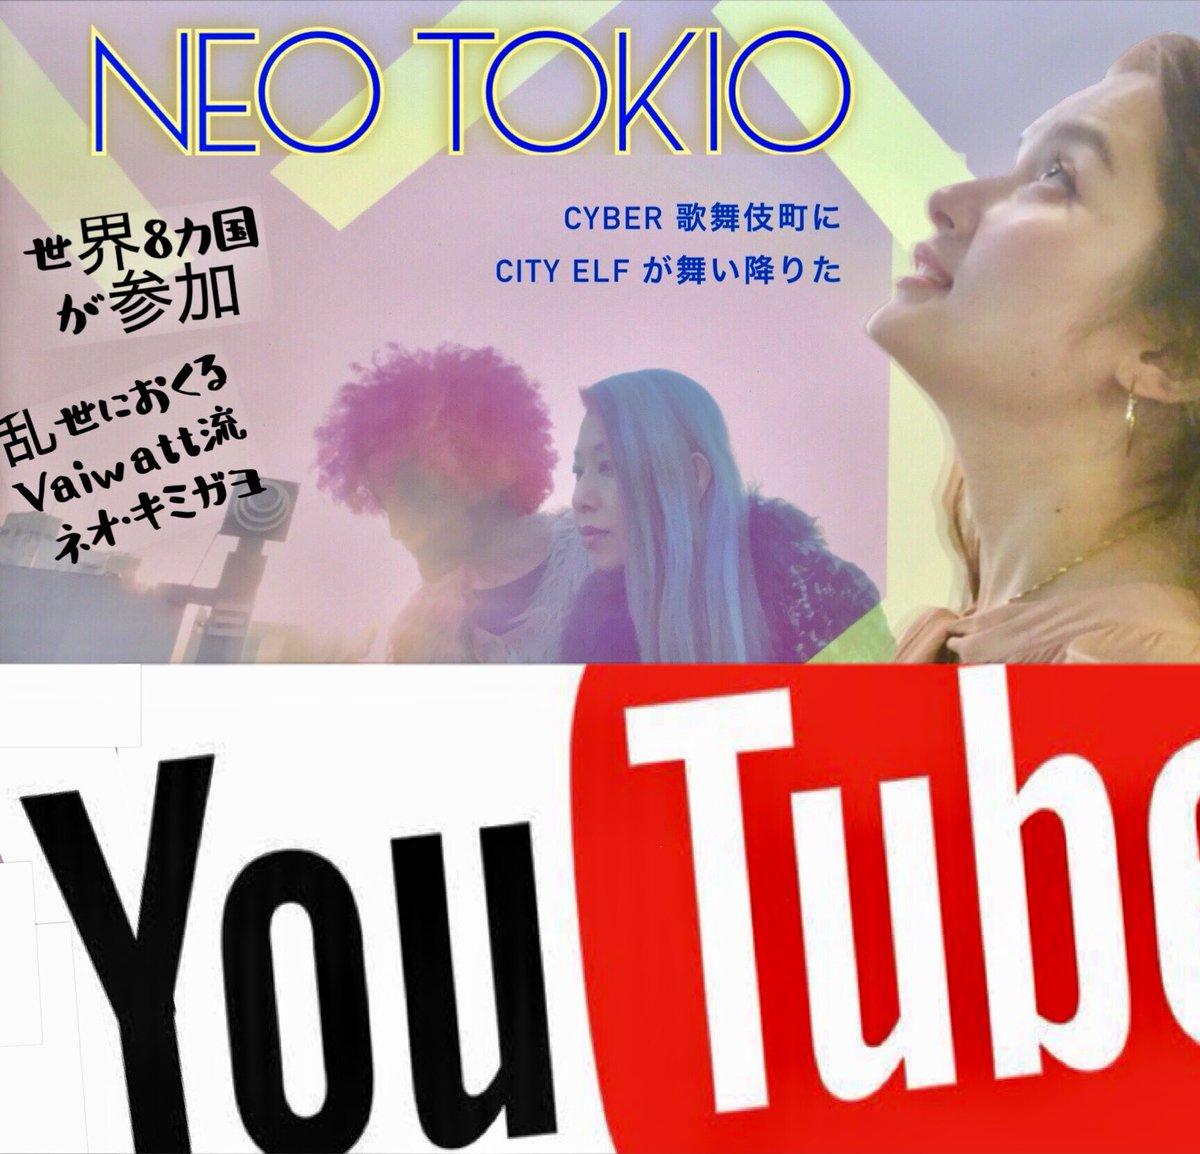 #Vaiwatt 新曲解禁  首都封鎖前  乱世に贈る Vaiwatt流 ネオ・キミガヨ  【 NEO TOKIO 】 Tokyo Tourism  ➡︎ http://youtu.be/y_s-8H_7ei0  #nippon #cyberjapan  #japananime #kabukicho #歌舞伎町 #shinjuku  #kawaii #jrock  #cosplay #東京ロックダウン #tokyo2021 #tokyotourism #君が代pic.twitter.com/d4AxoCsOYW